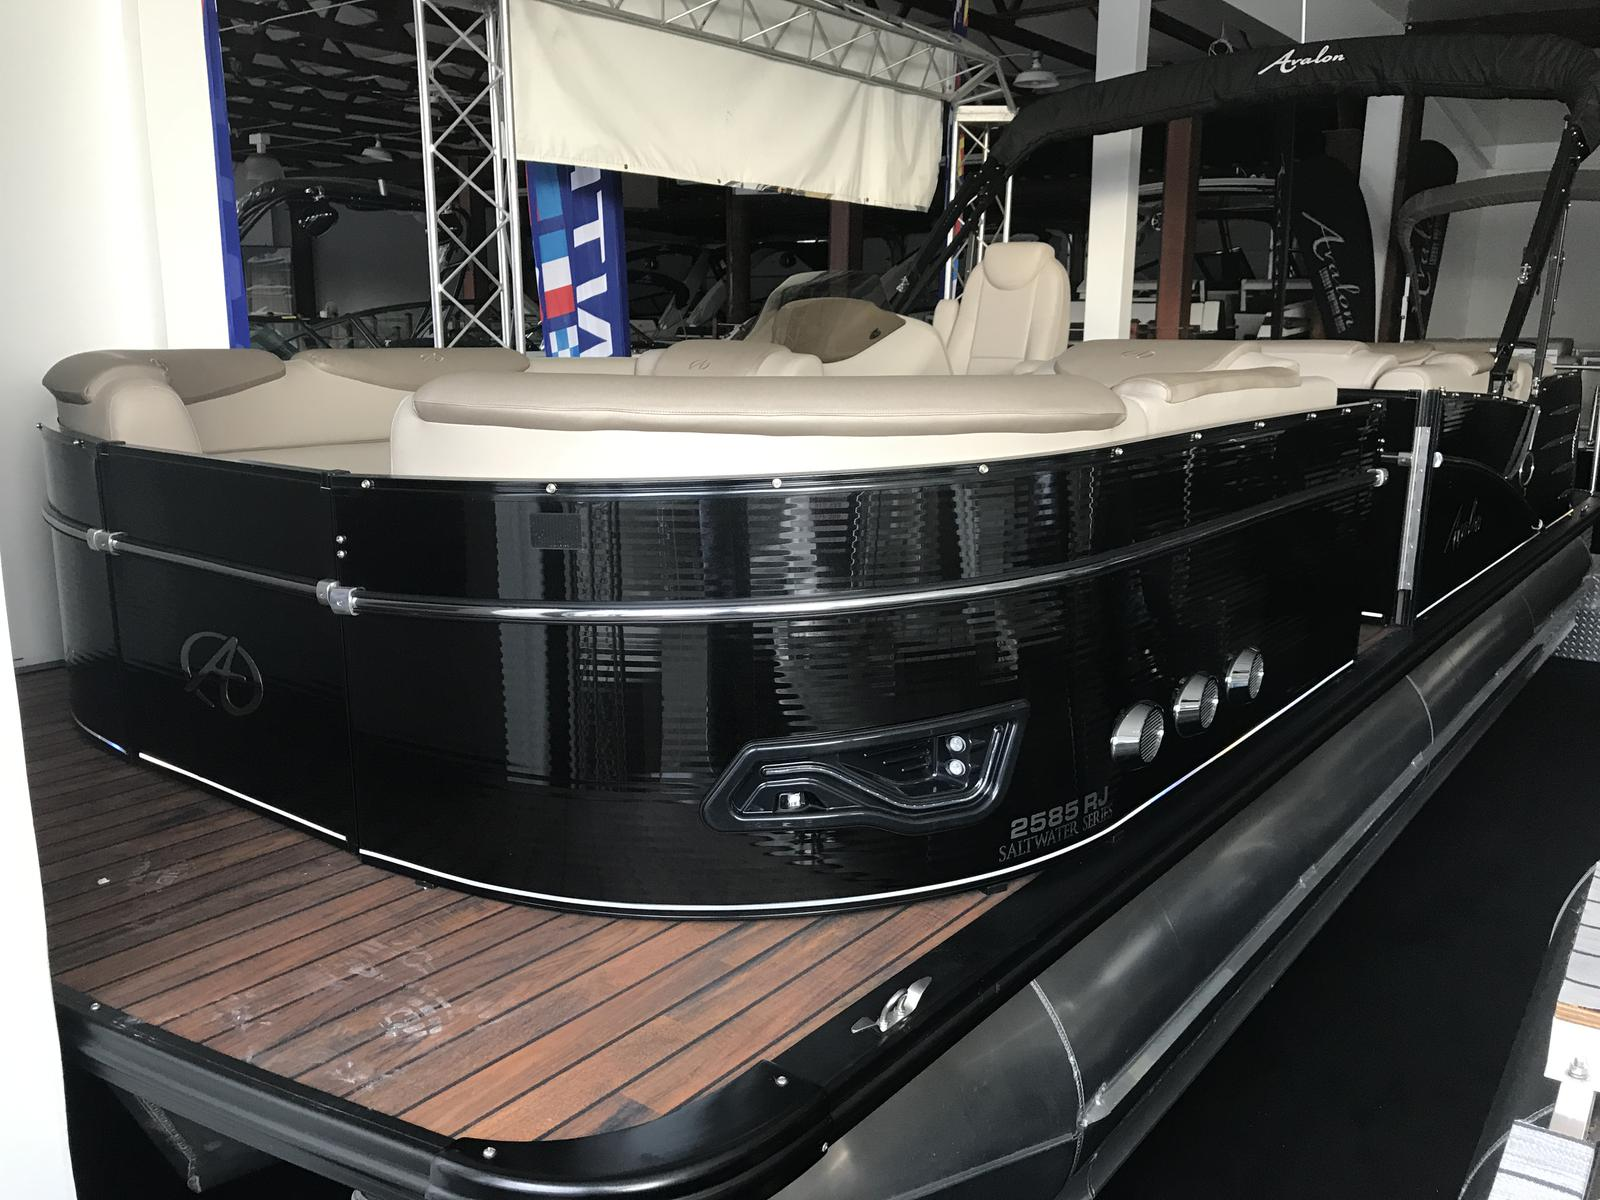 Avalon 2585 Rear J Lounger